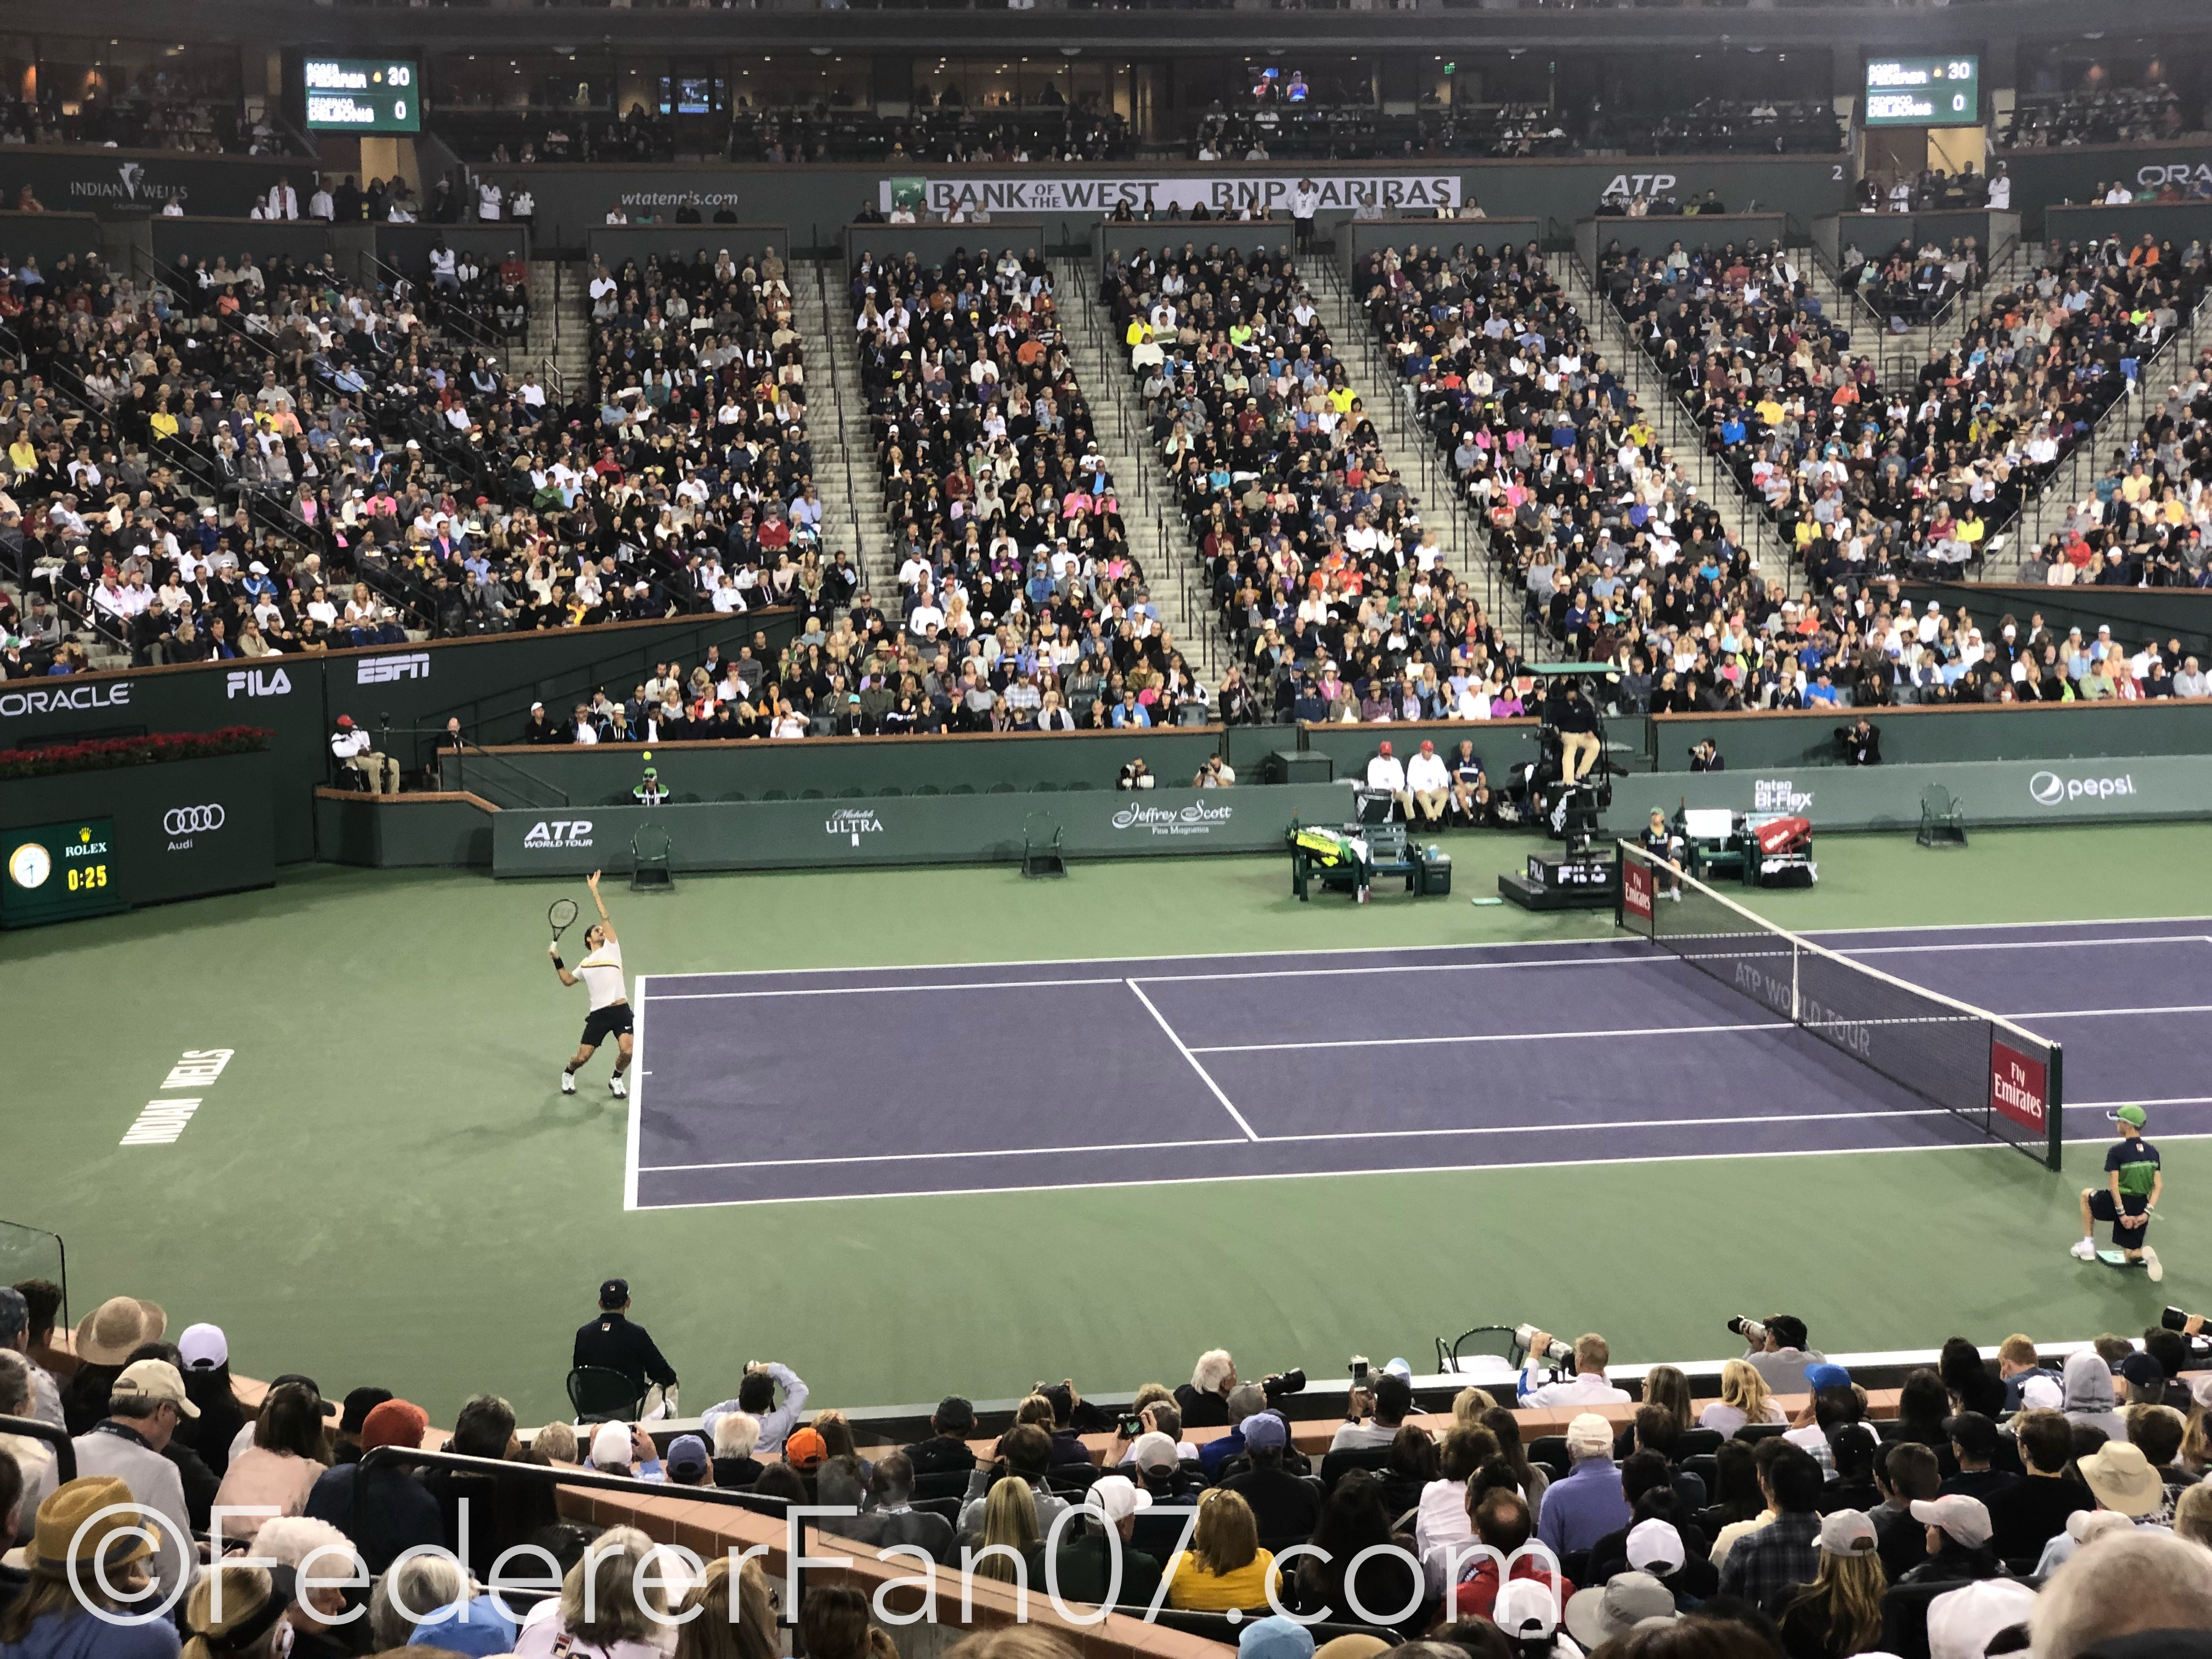 Roger Federer 2018 BNP Paribas Open (Indian Wells BNPPO18) - Federer Wins Rare Rain Delay in Indian Wells